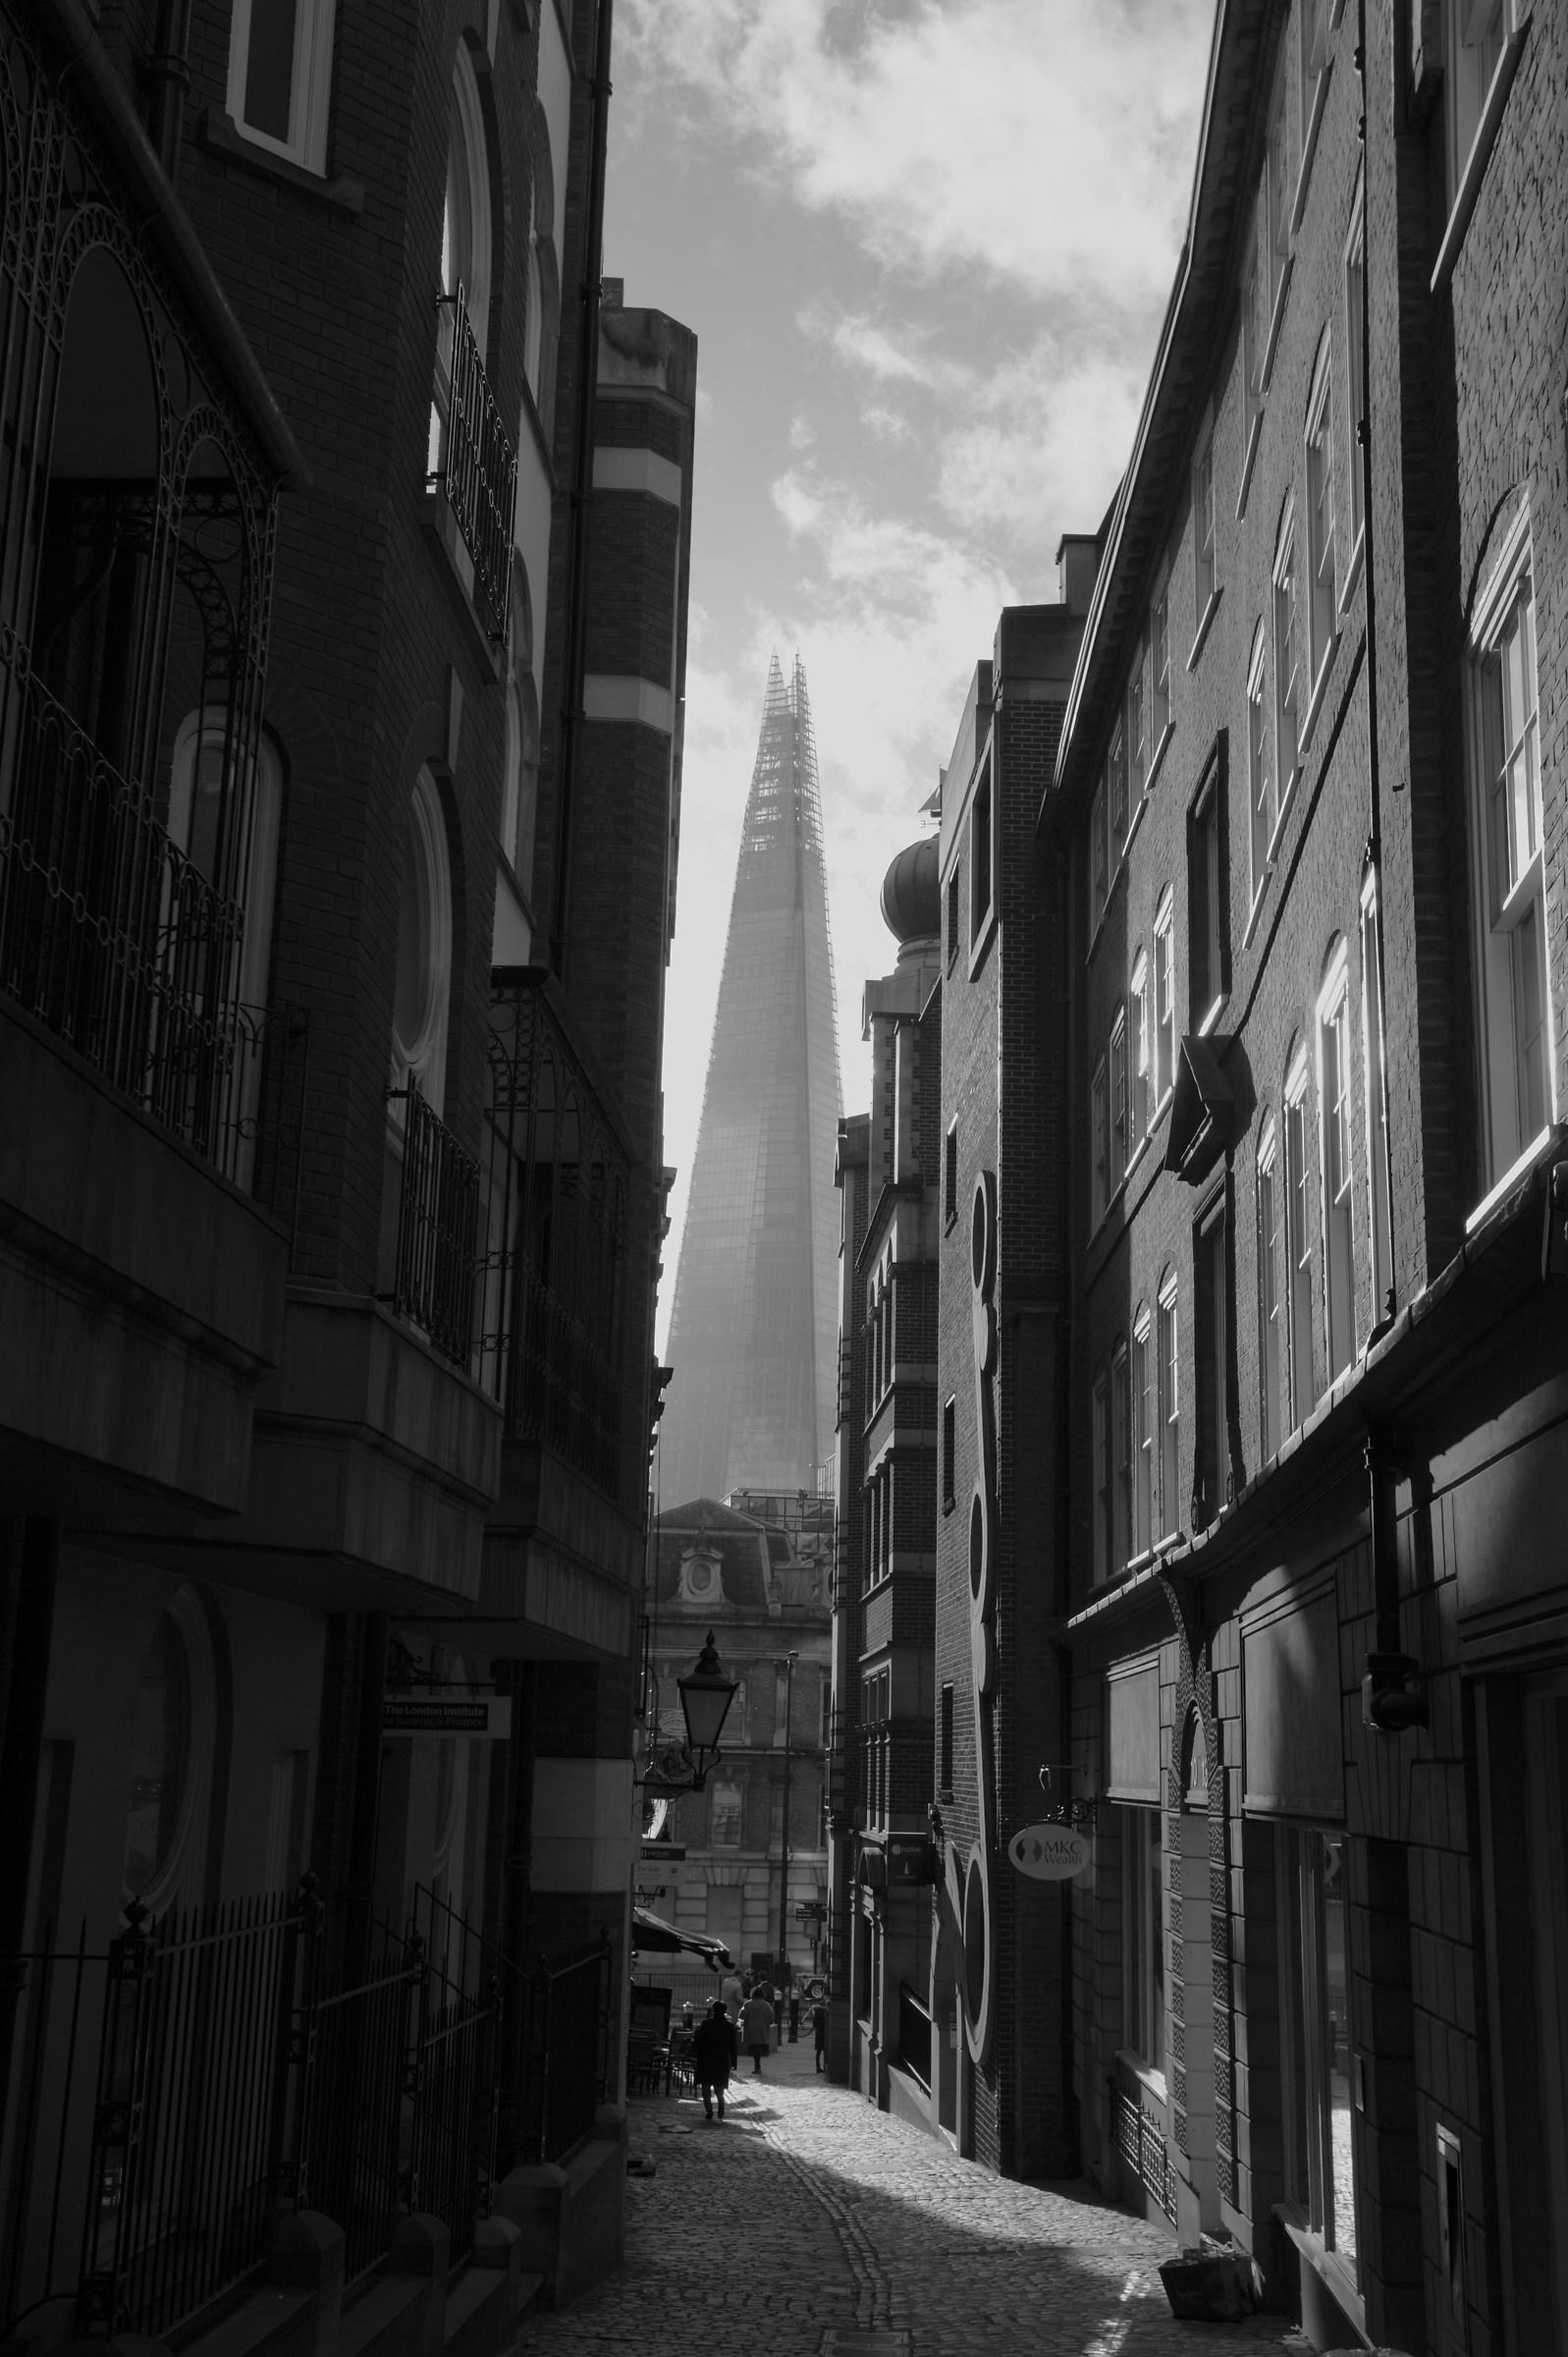 Gotham City - The Shard...